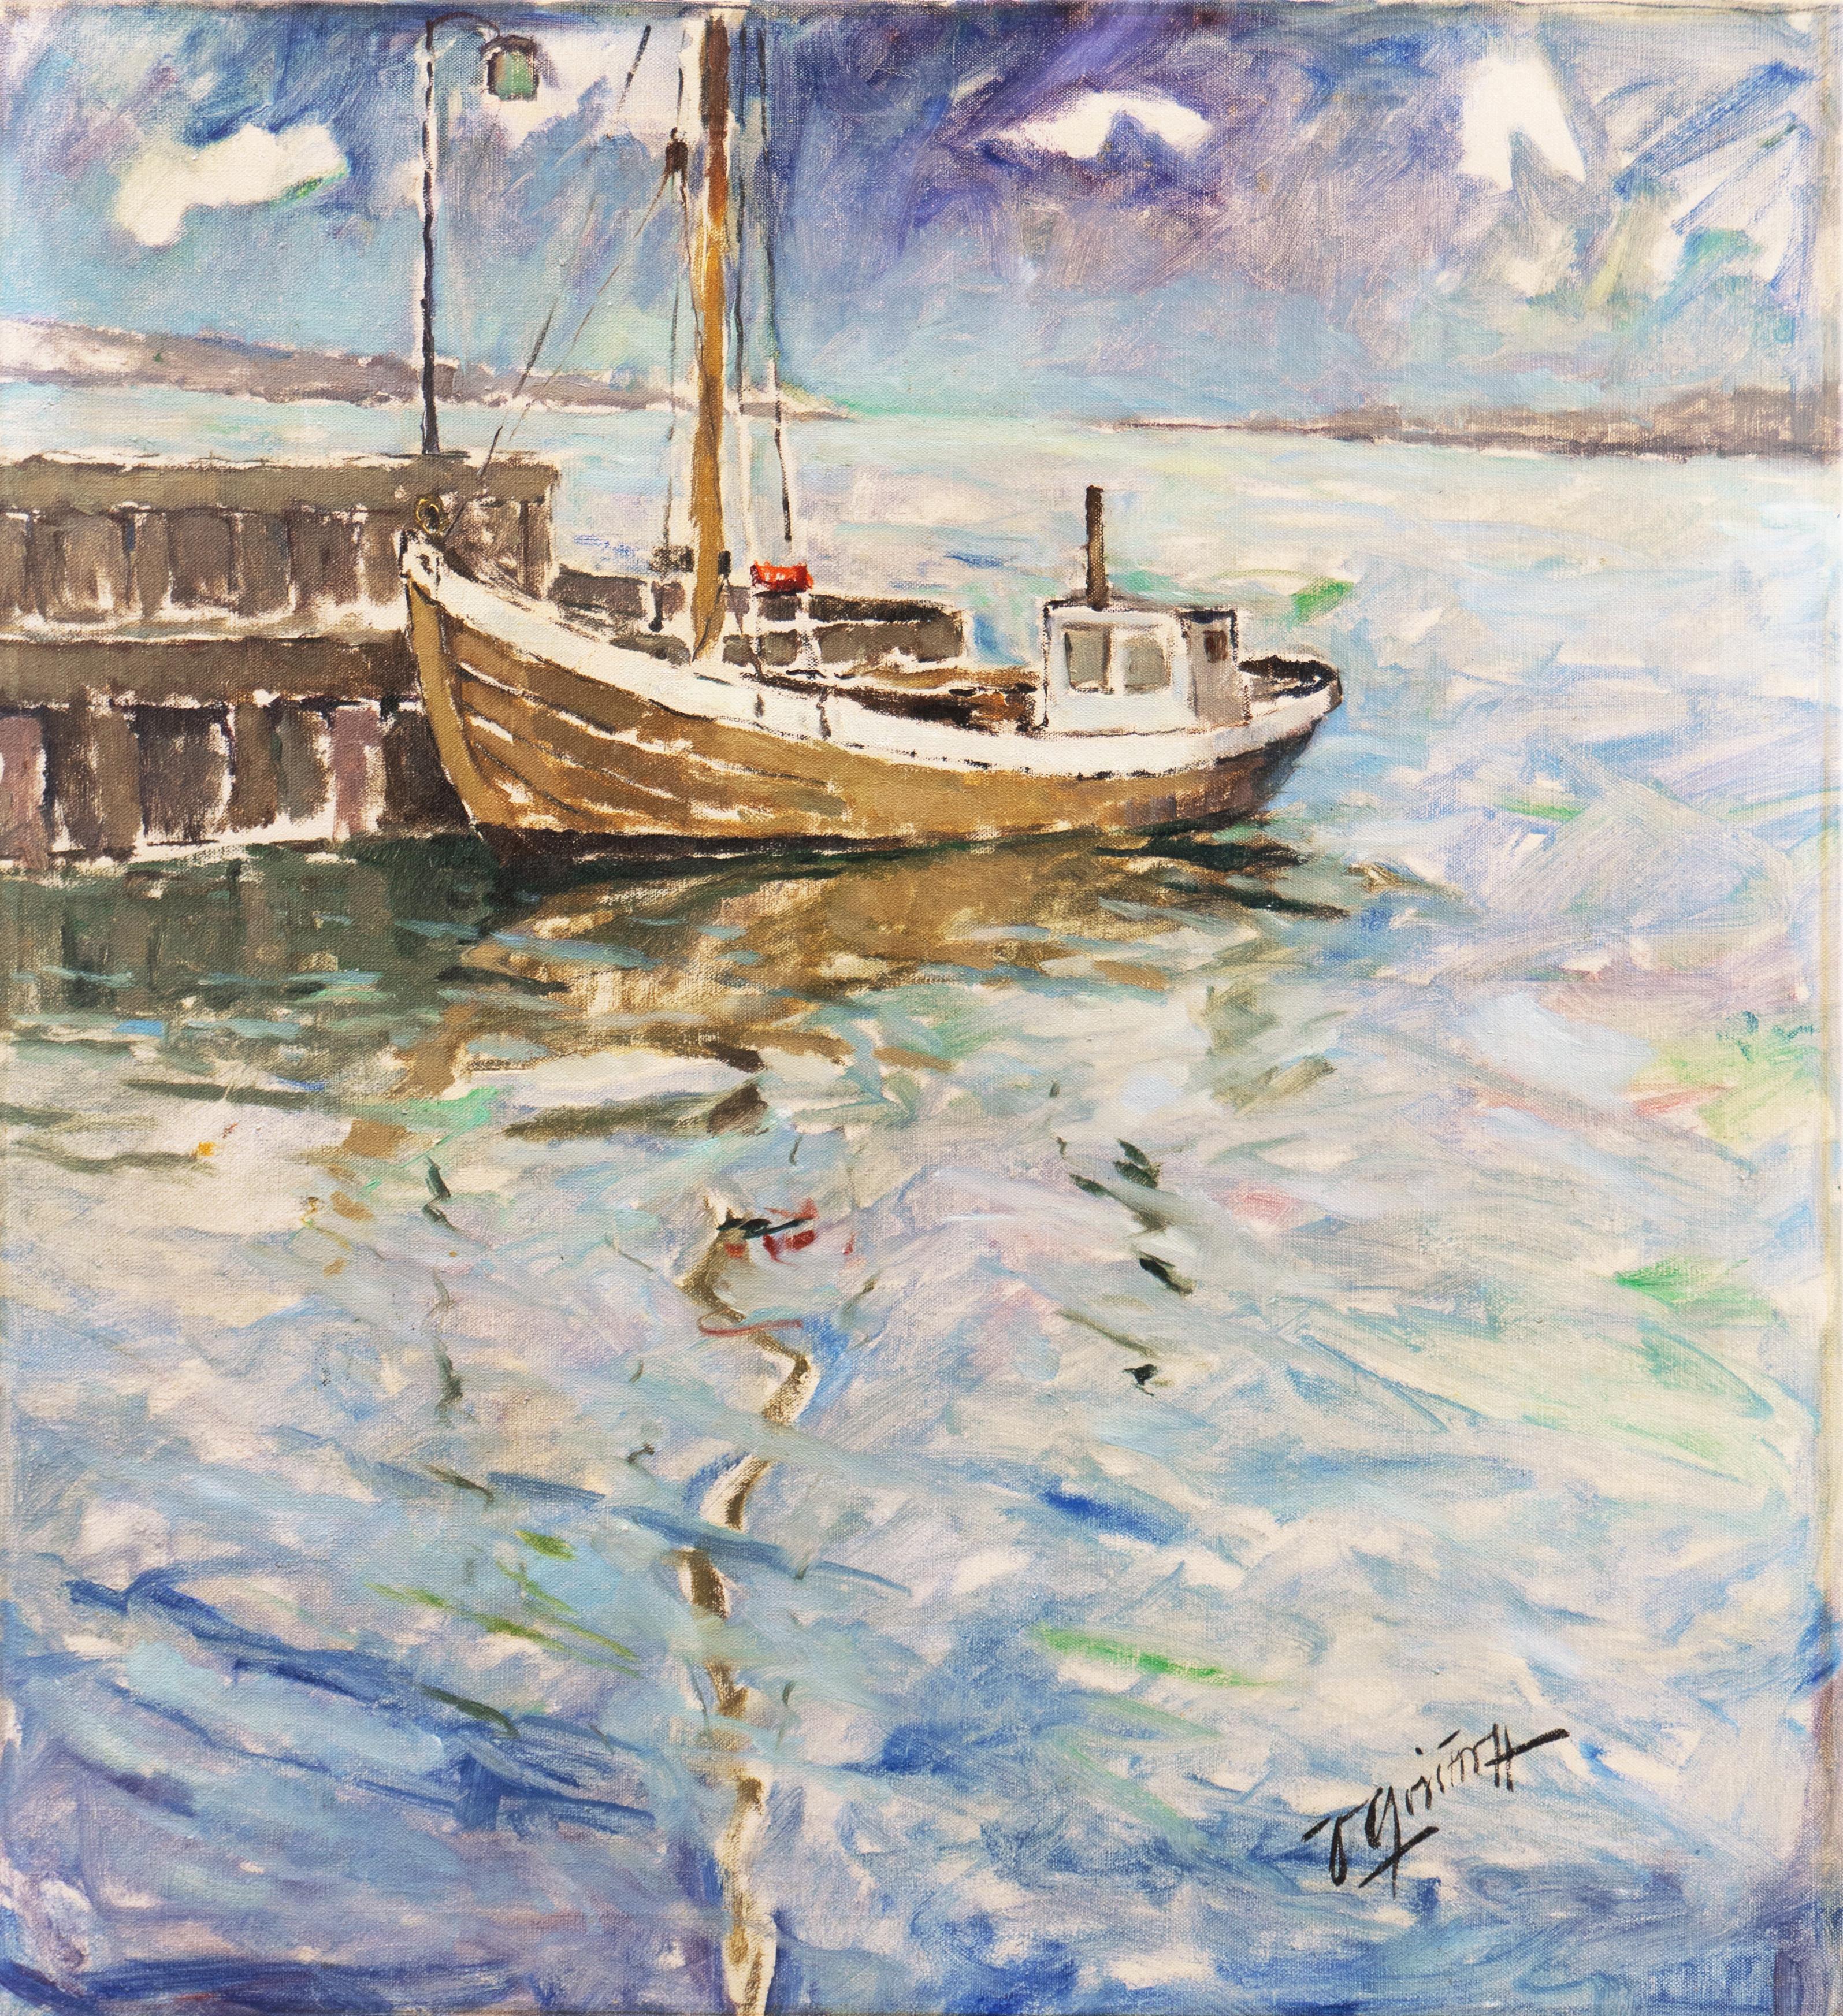 'Fishing Boat at Dawn', Danish Post-Impressionism, Weilbach Kunstleksikon